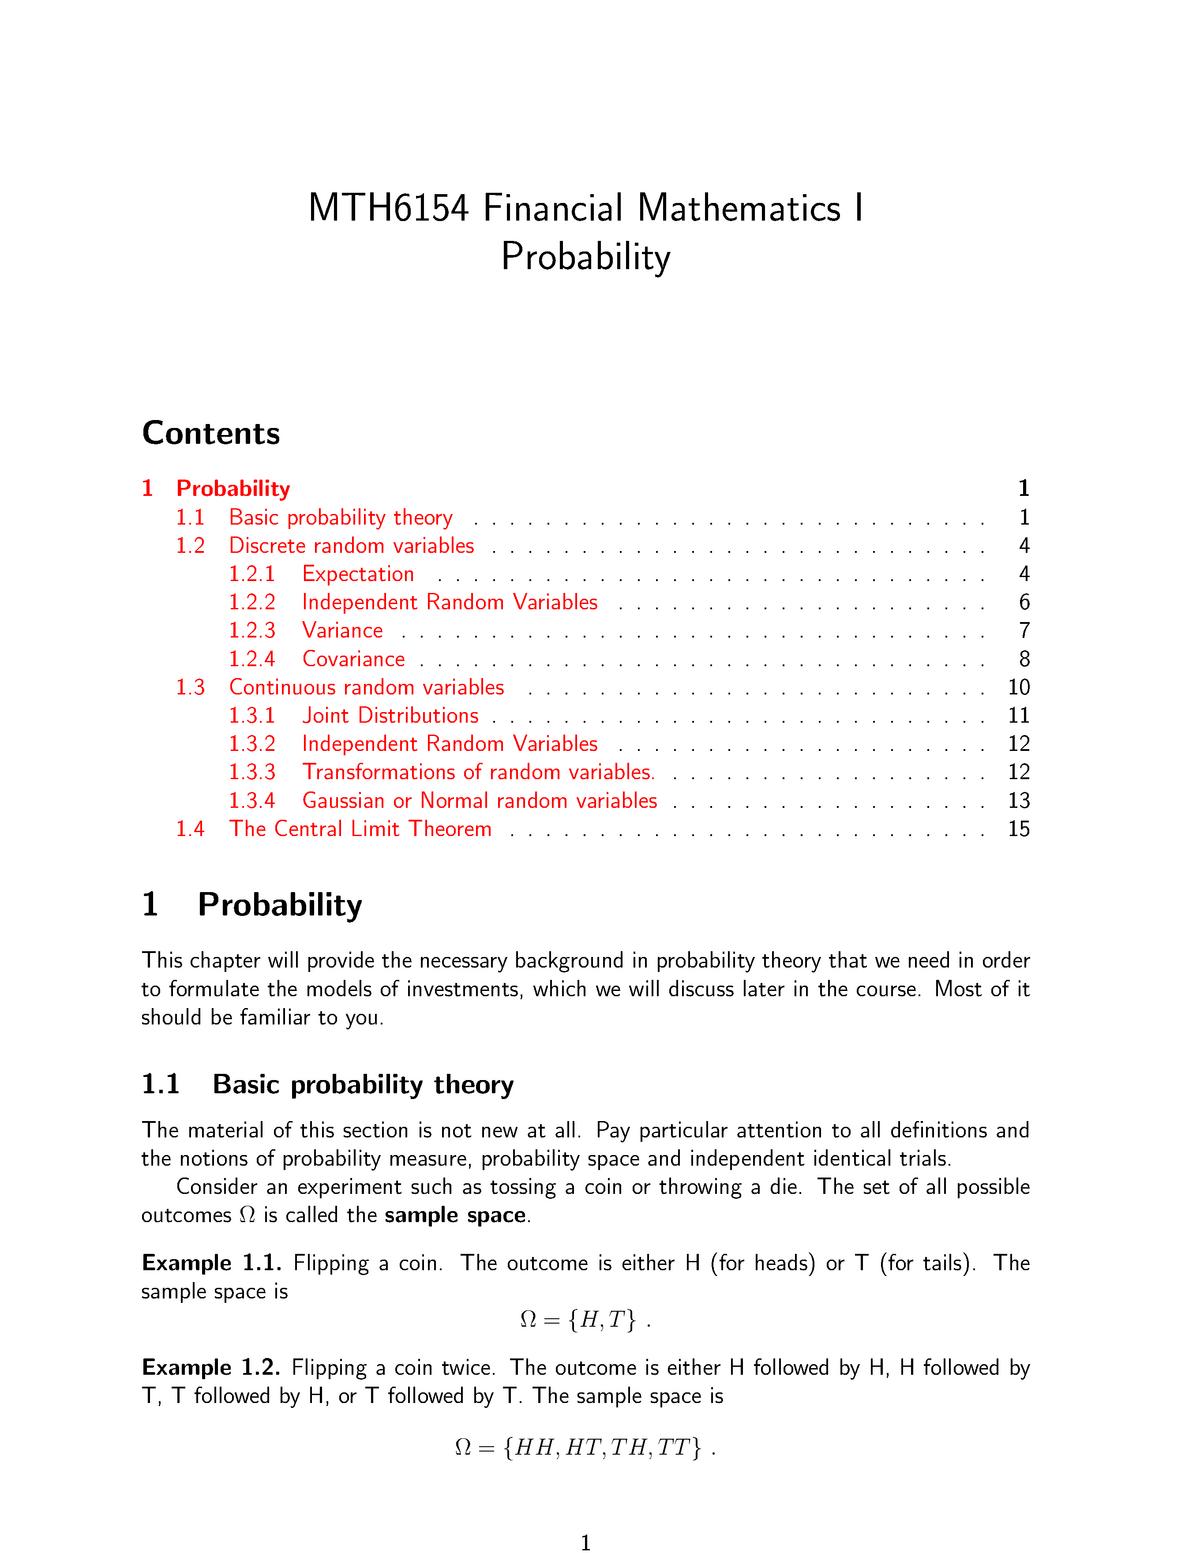 Probability Chapter 01 Financial Mathematics I Mth6154 Studocu